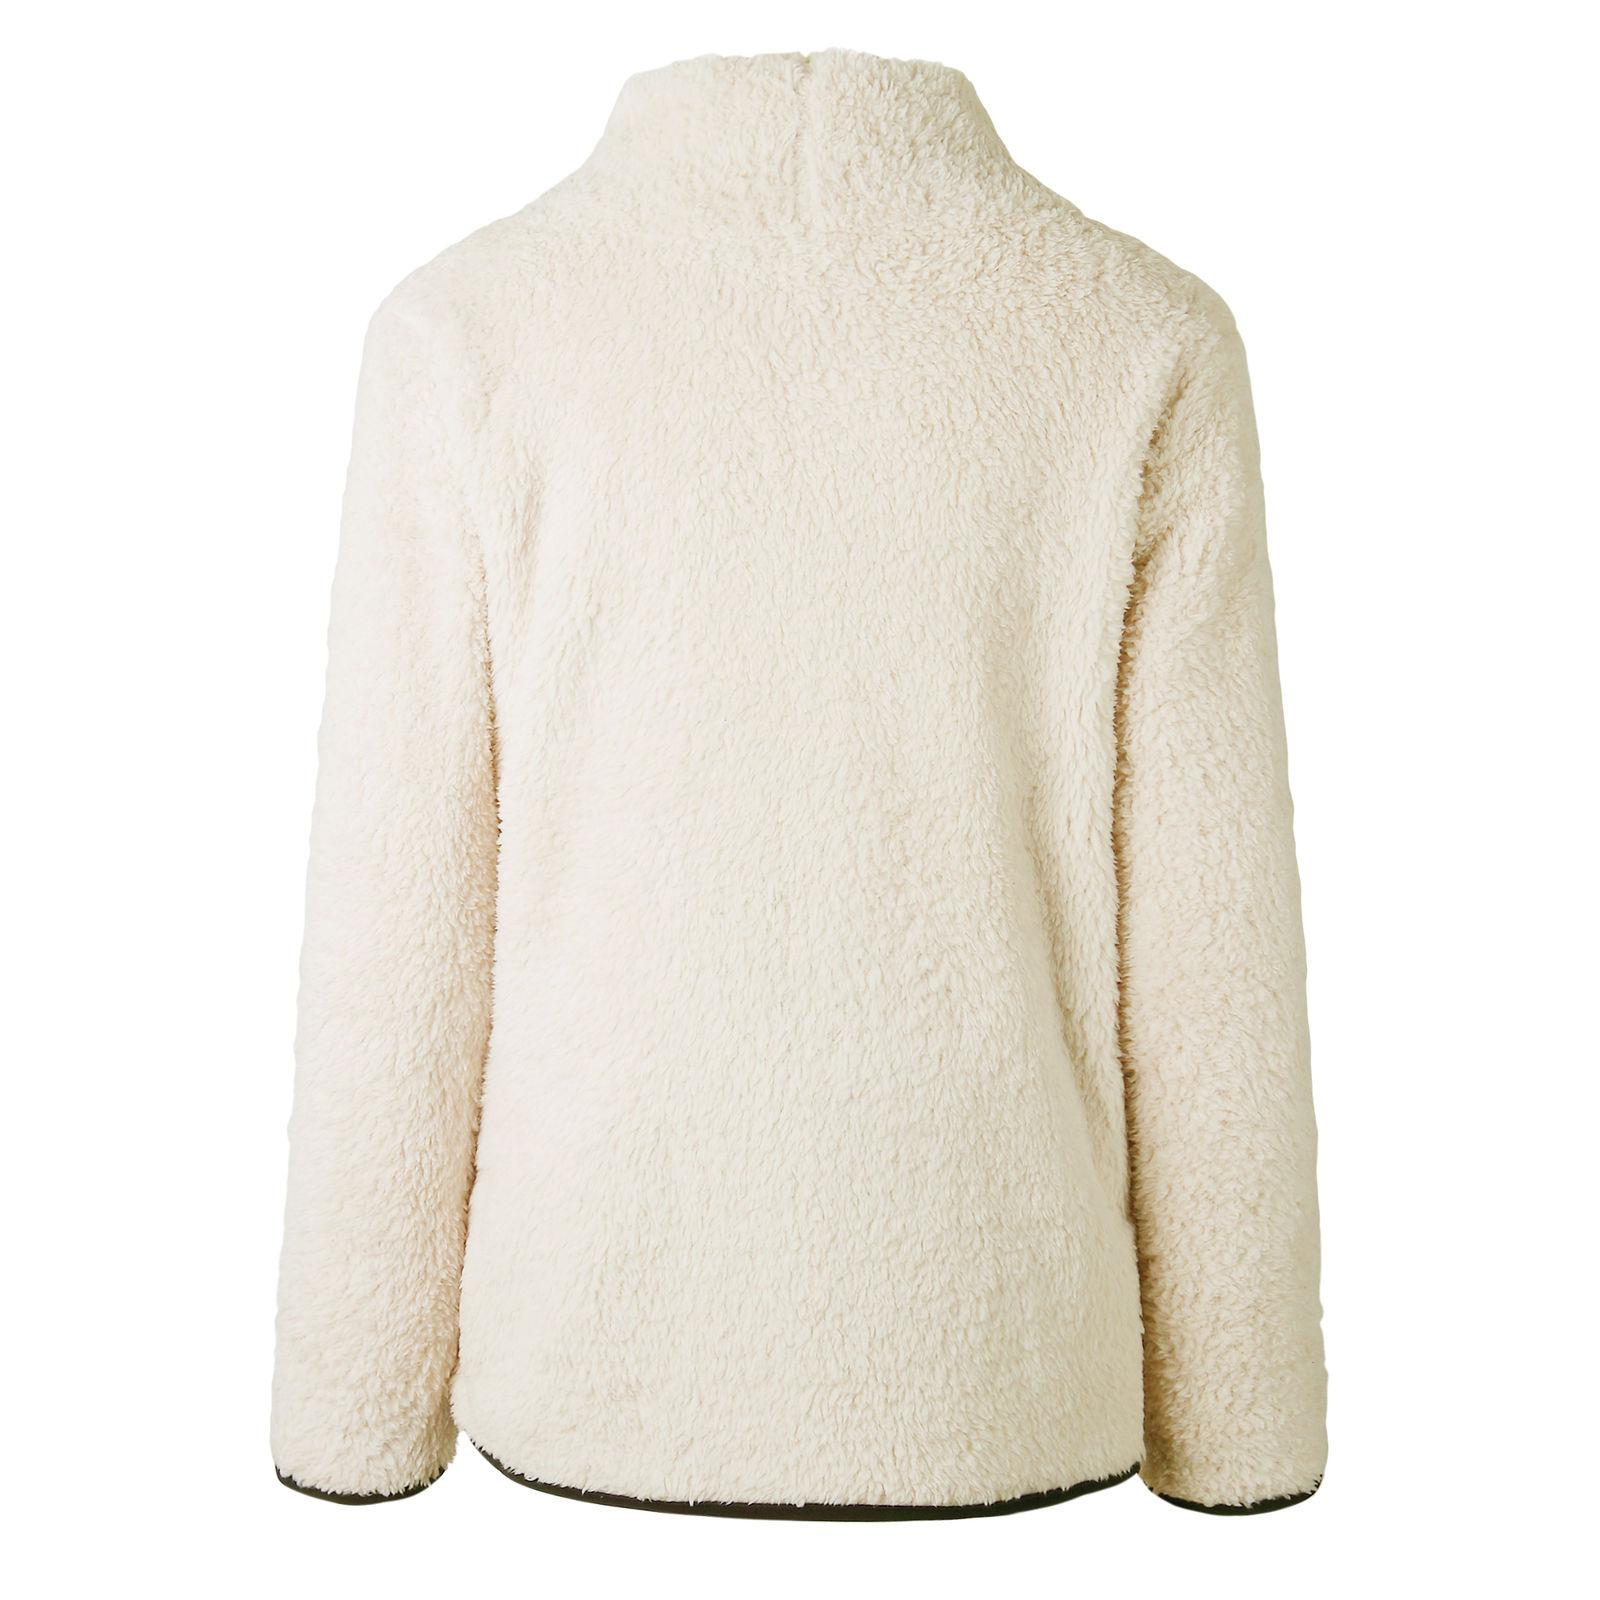 Casual Fest Rollkragen Langarm-lose Plüsch Fluffy Sweatshirt Frauen Warm-Winter-warmer Fleece Pullover Pullover Sweatshirts